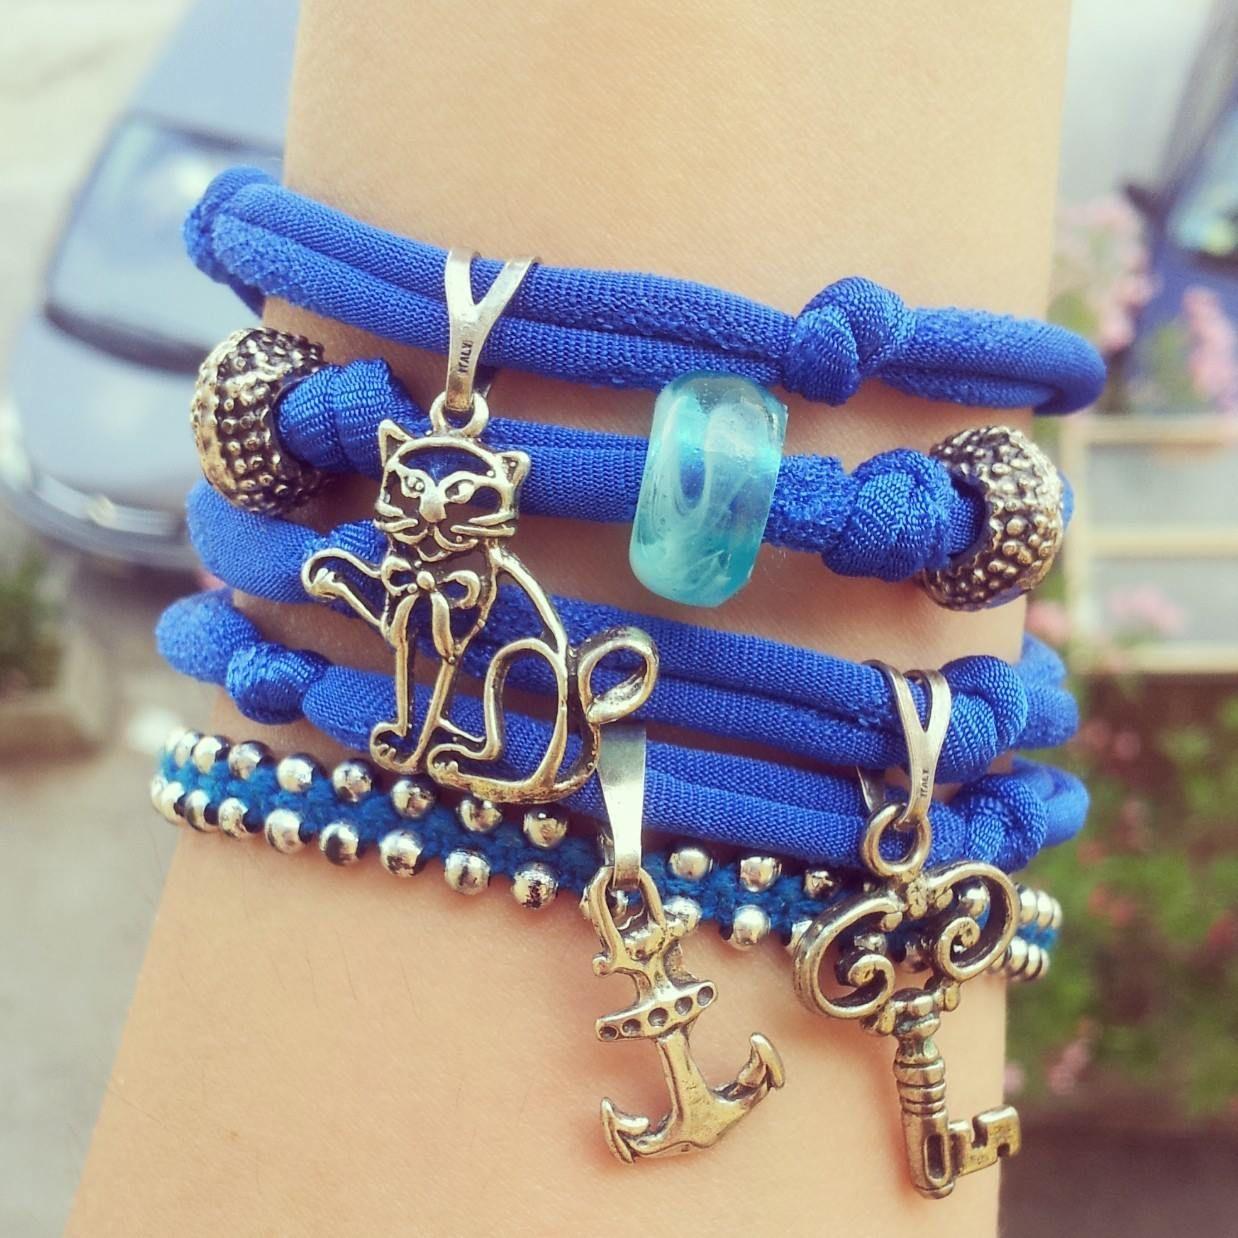 Nylon bracelet #silver #nylon #summer2013